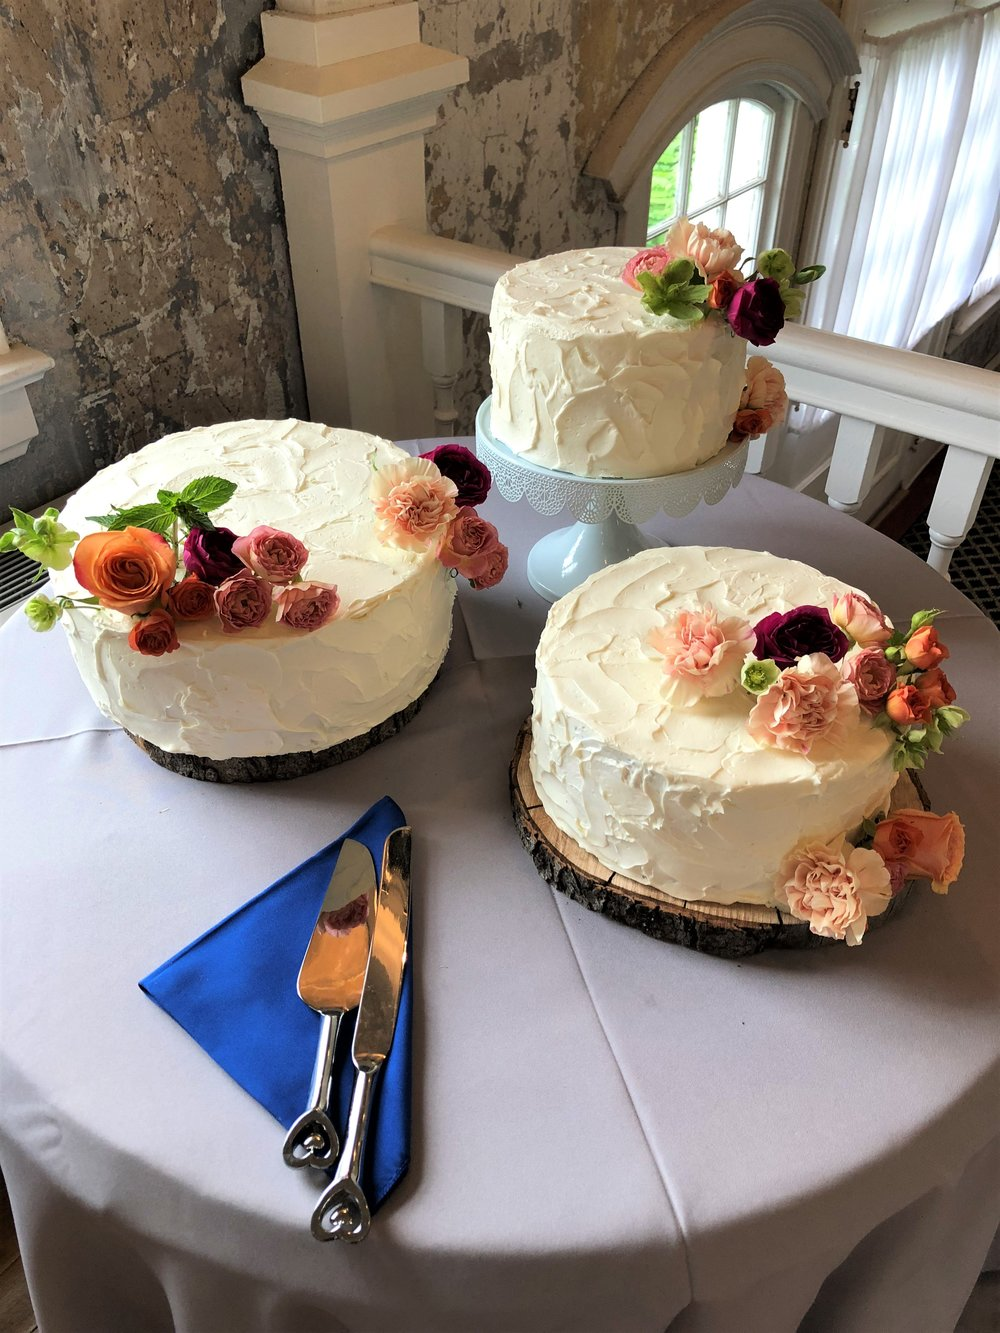 06.10.2018 The Hall at Castle Inn DWG O'Rourke Johnson Wedding Cake Table 3.JPG